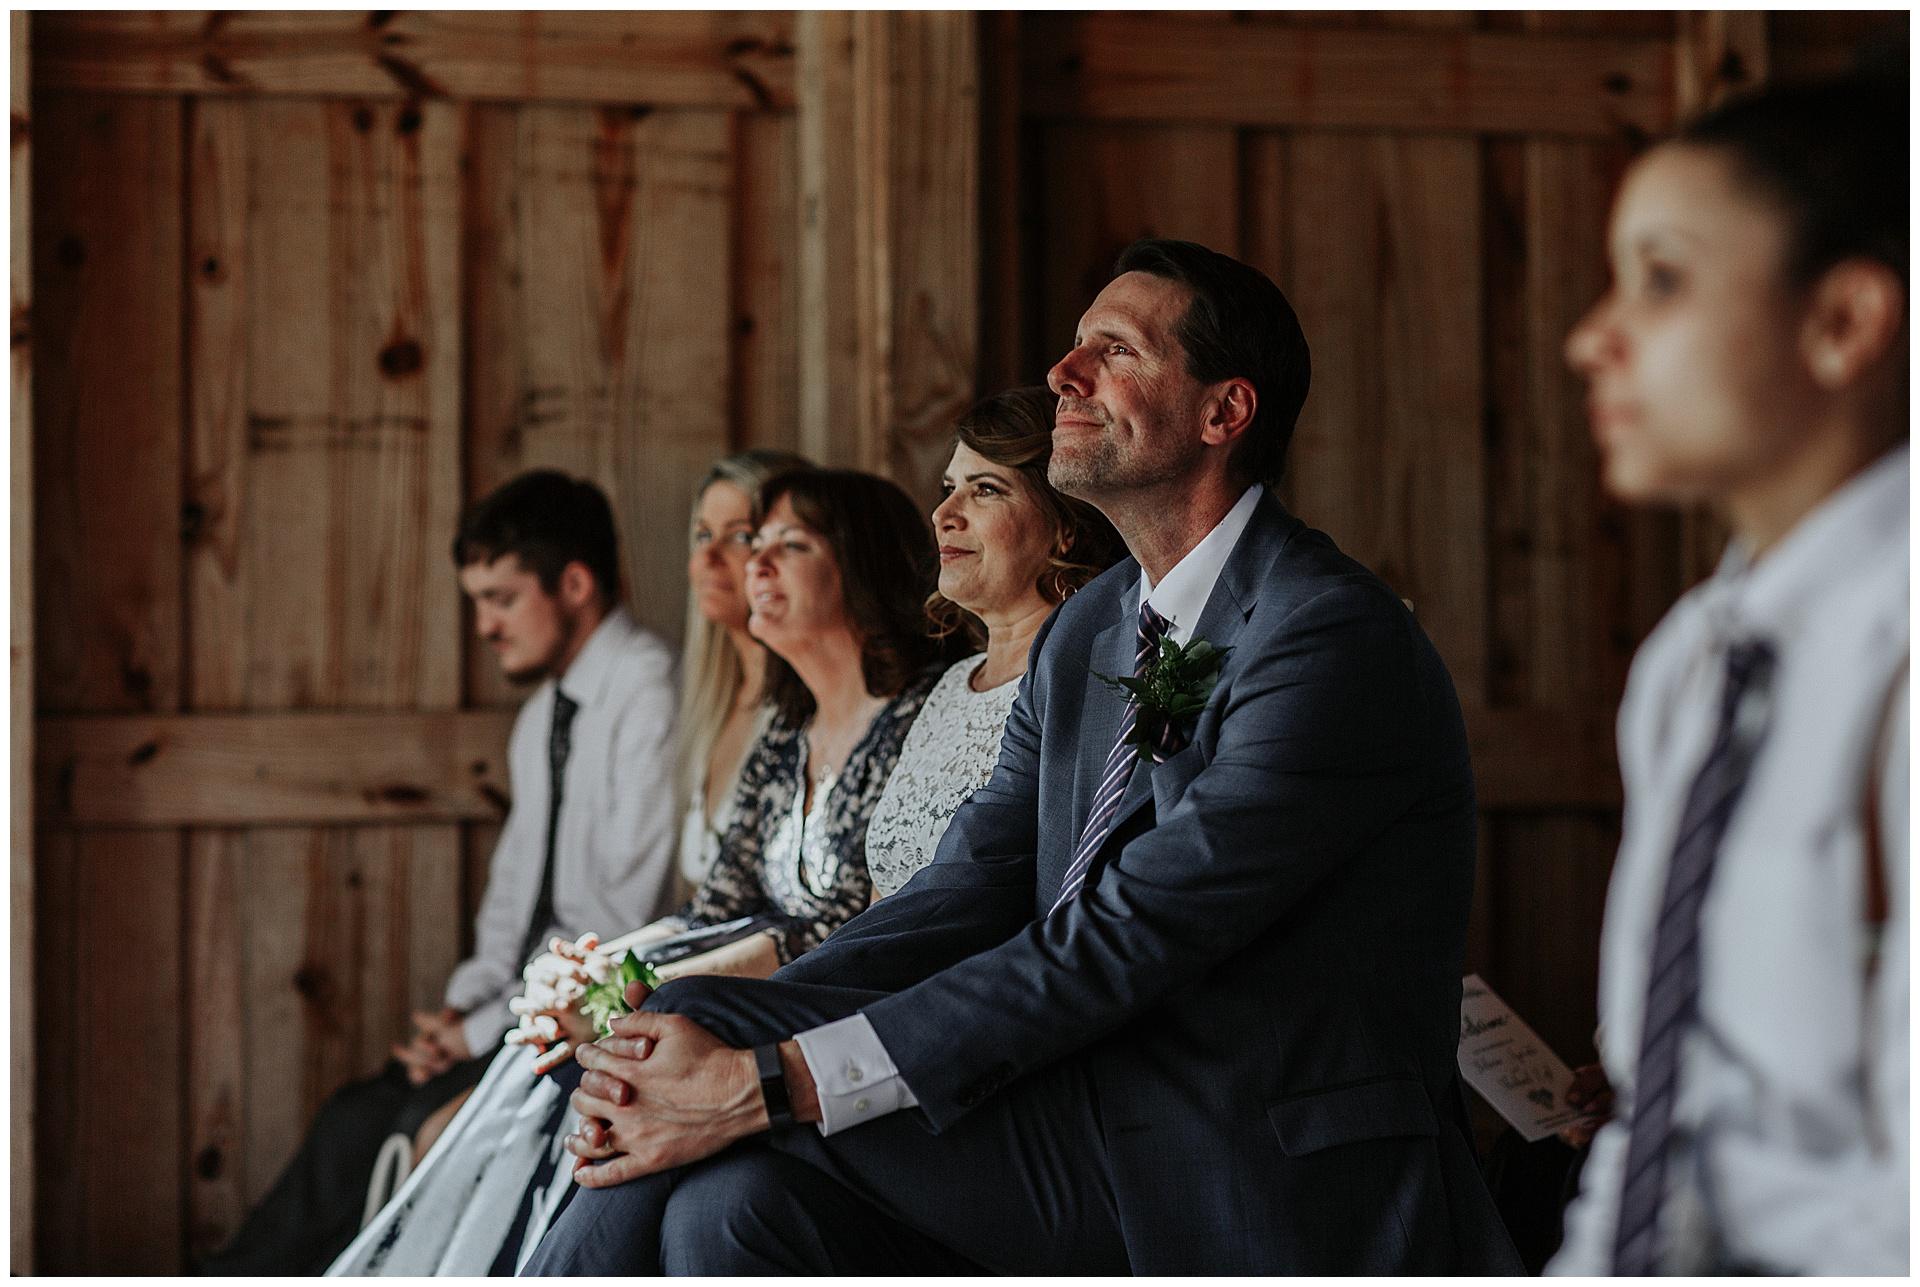 st augustine wedding photographer_mia dimare photography18.jpg